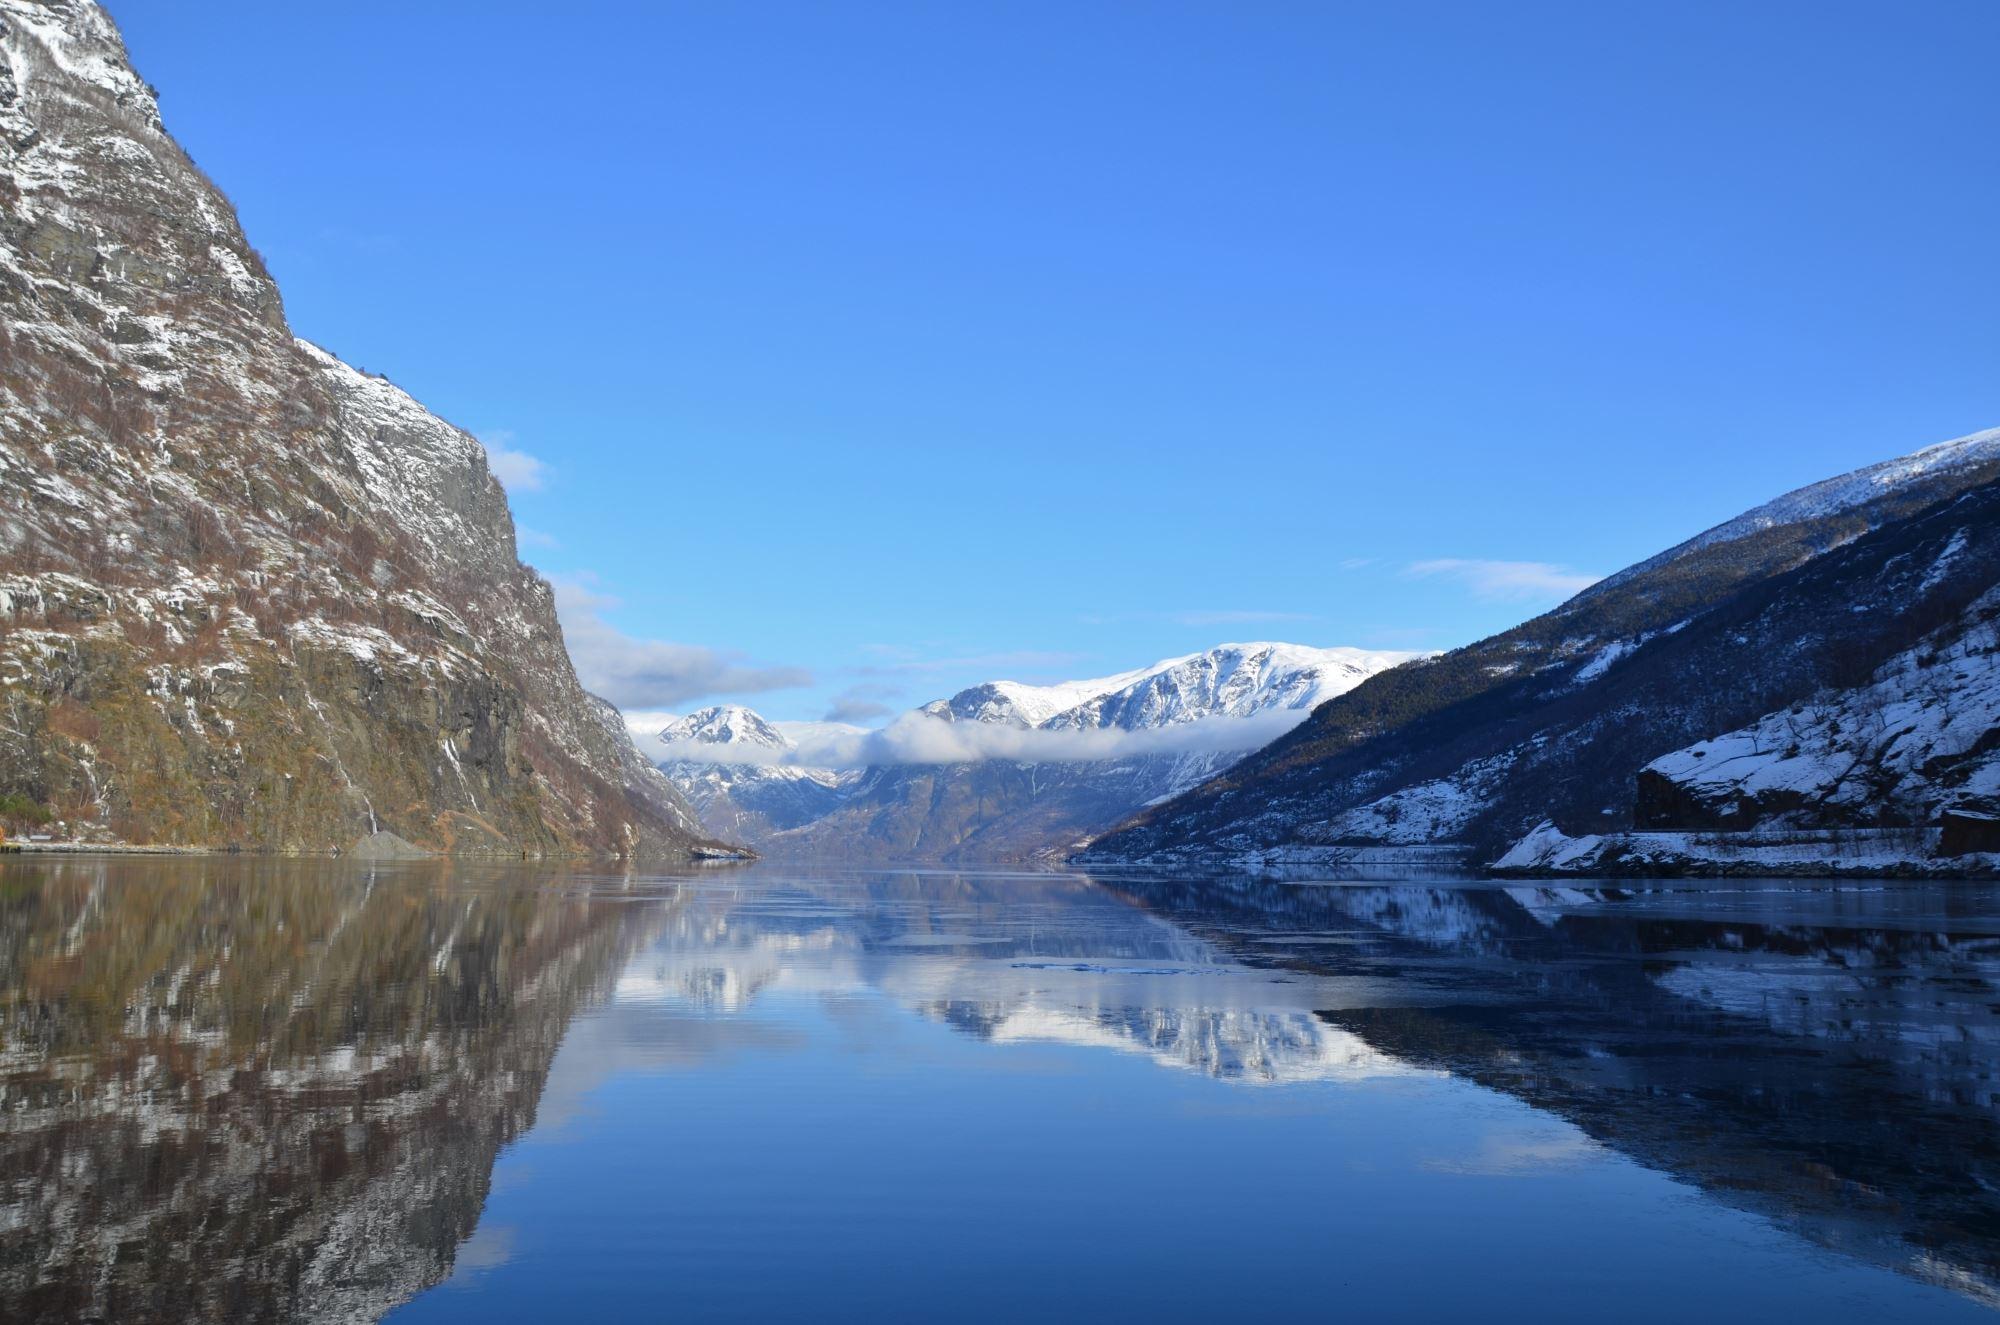 Vinter FjordSafari